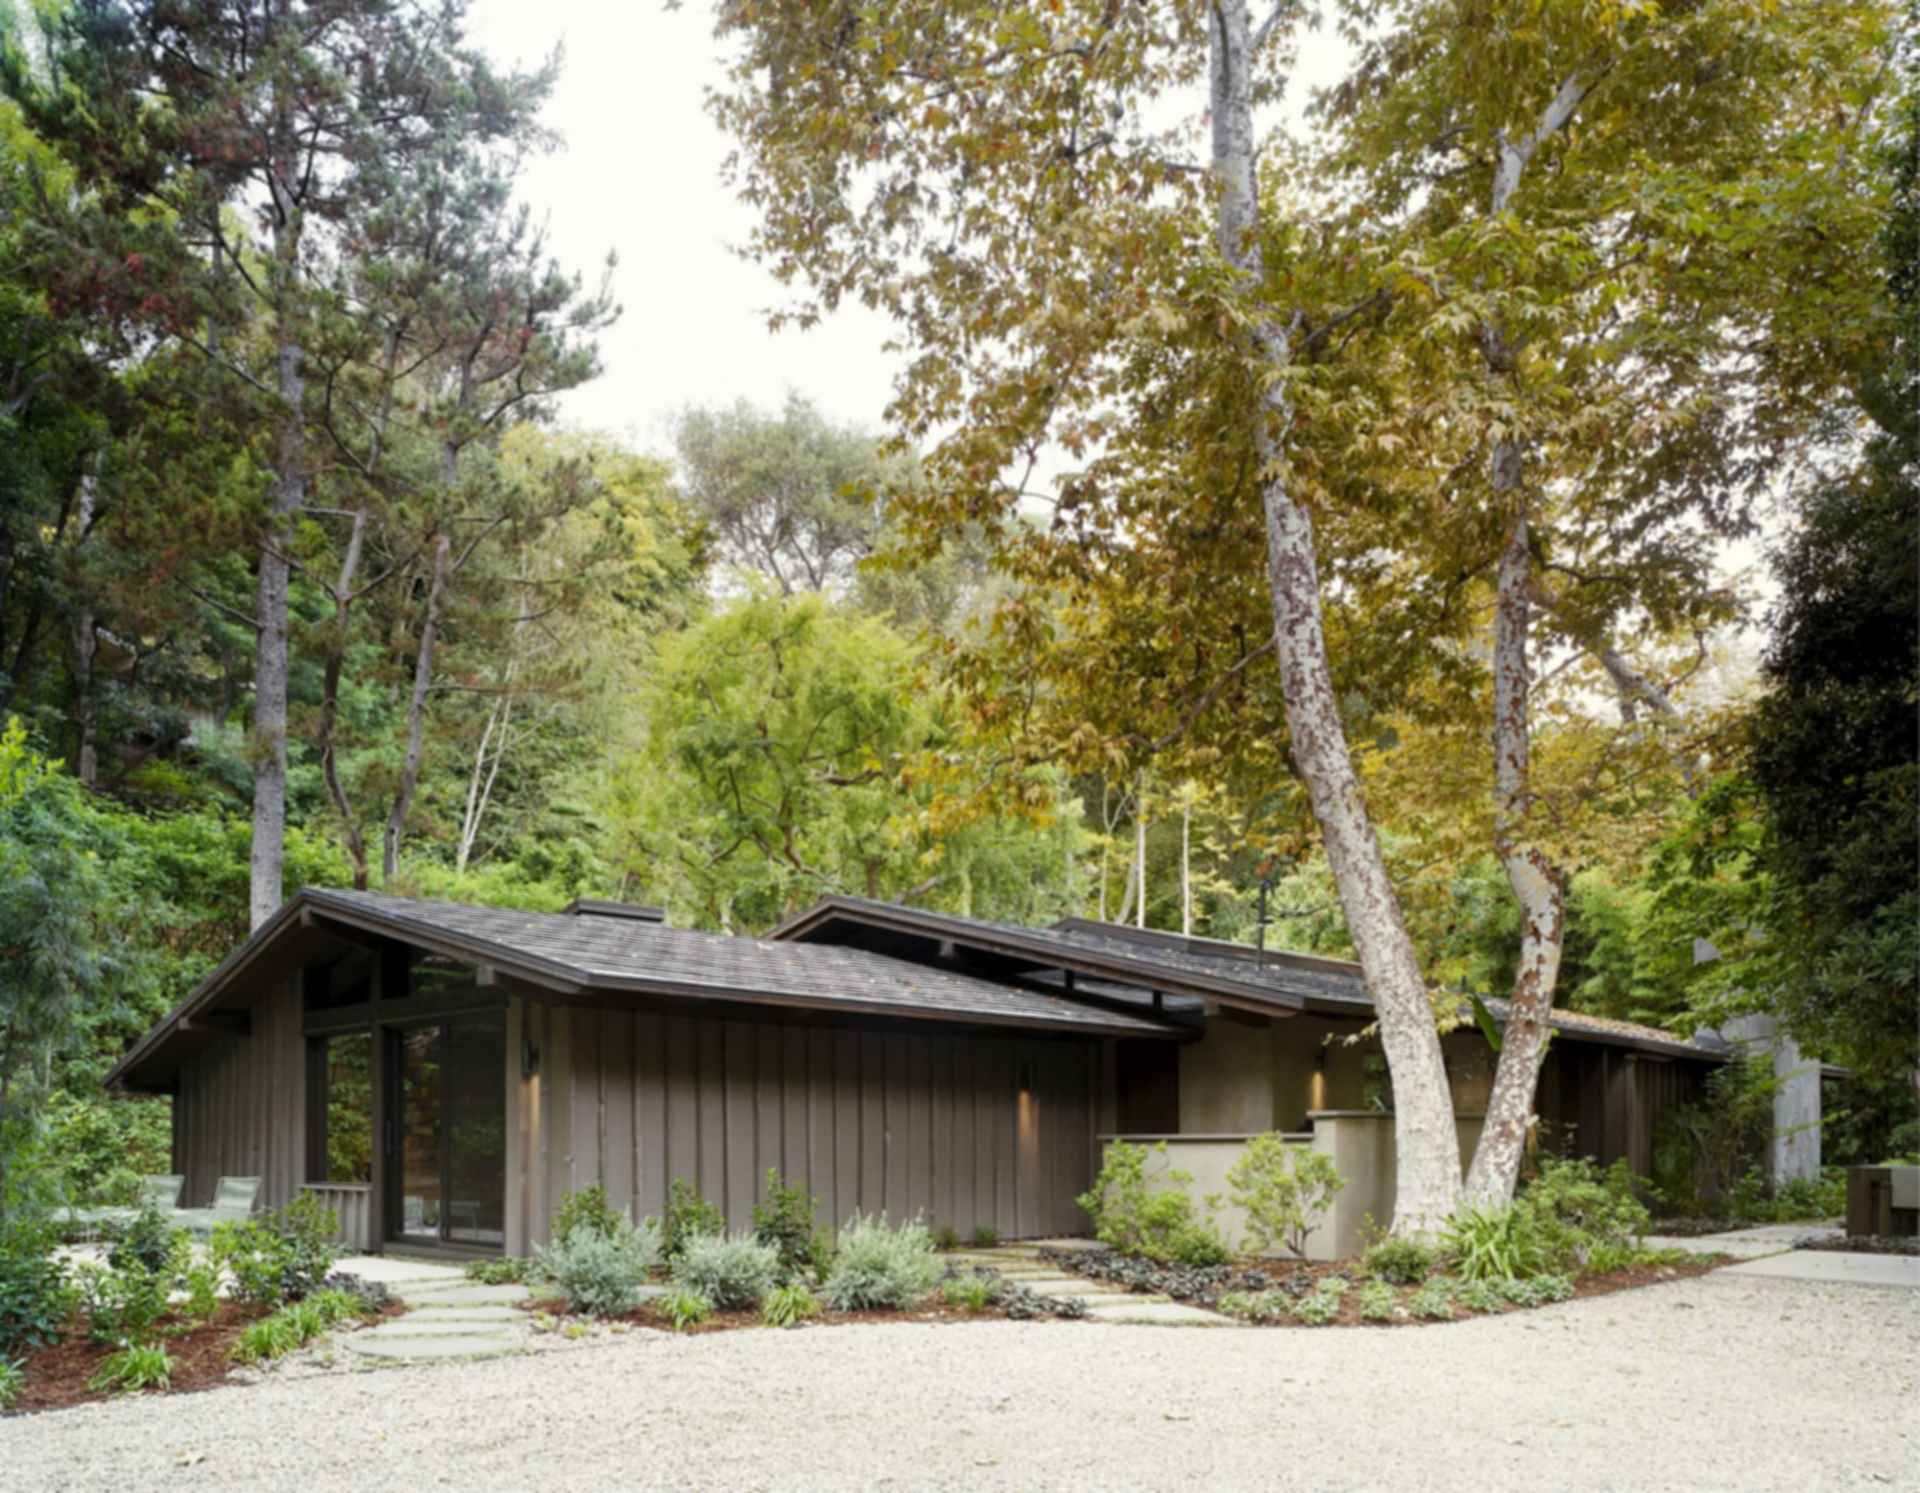 The Experimental Ranch - Exterior